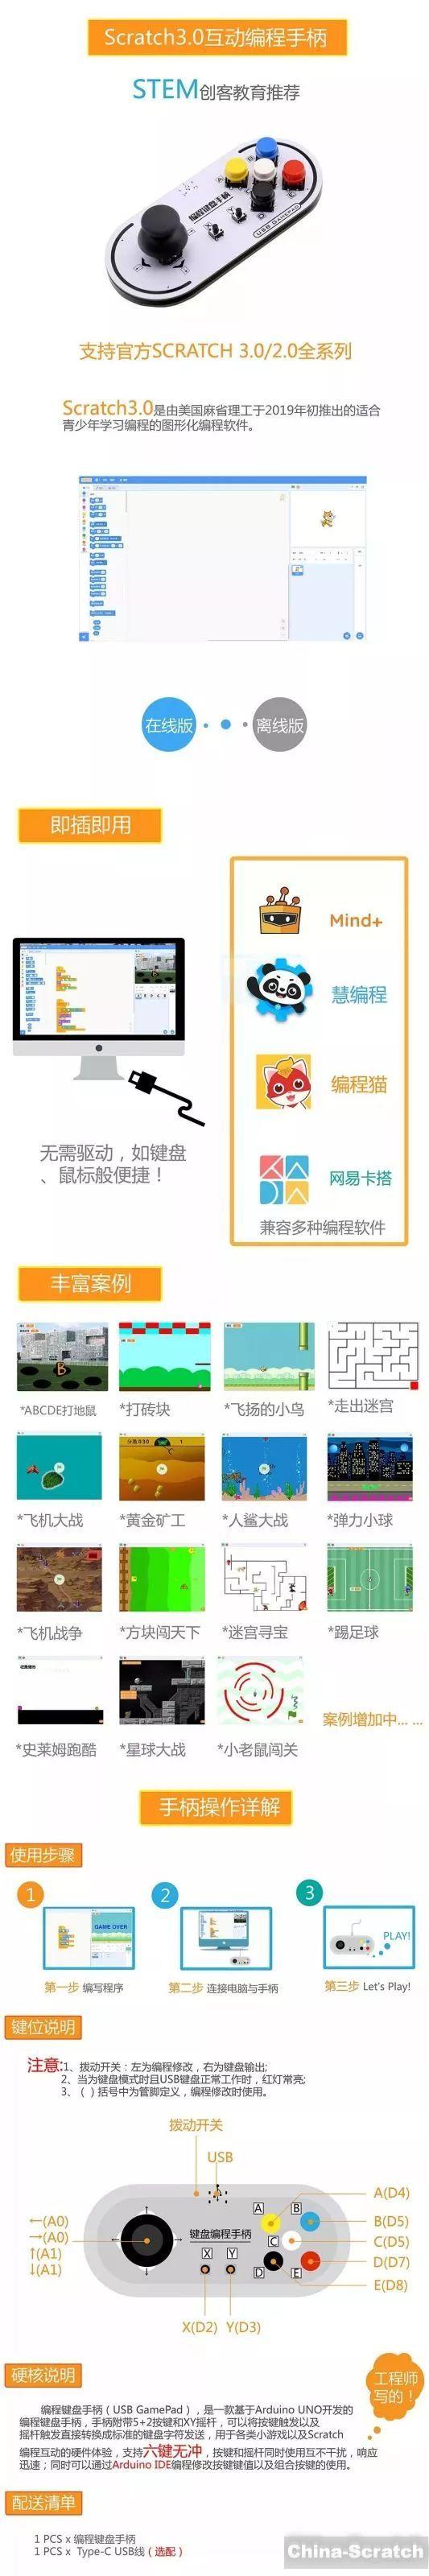 https://cdn.china-scratch.com/timg/191211/1040433E4-2.jpg